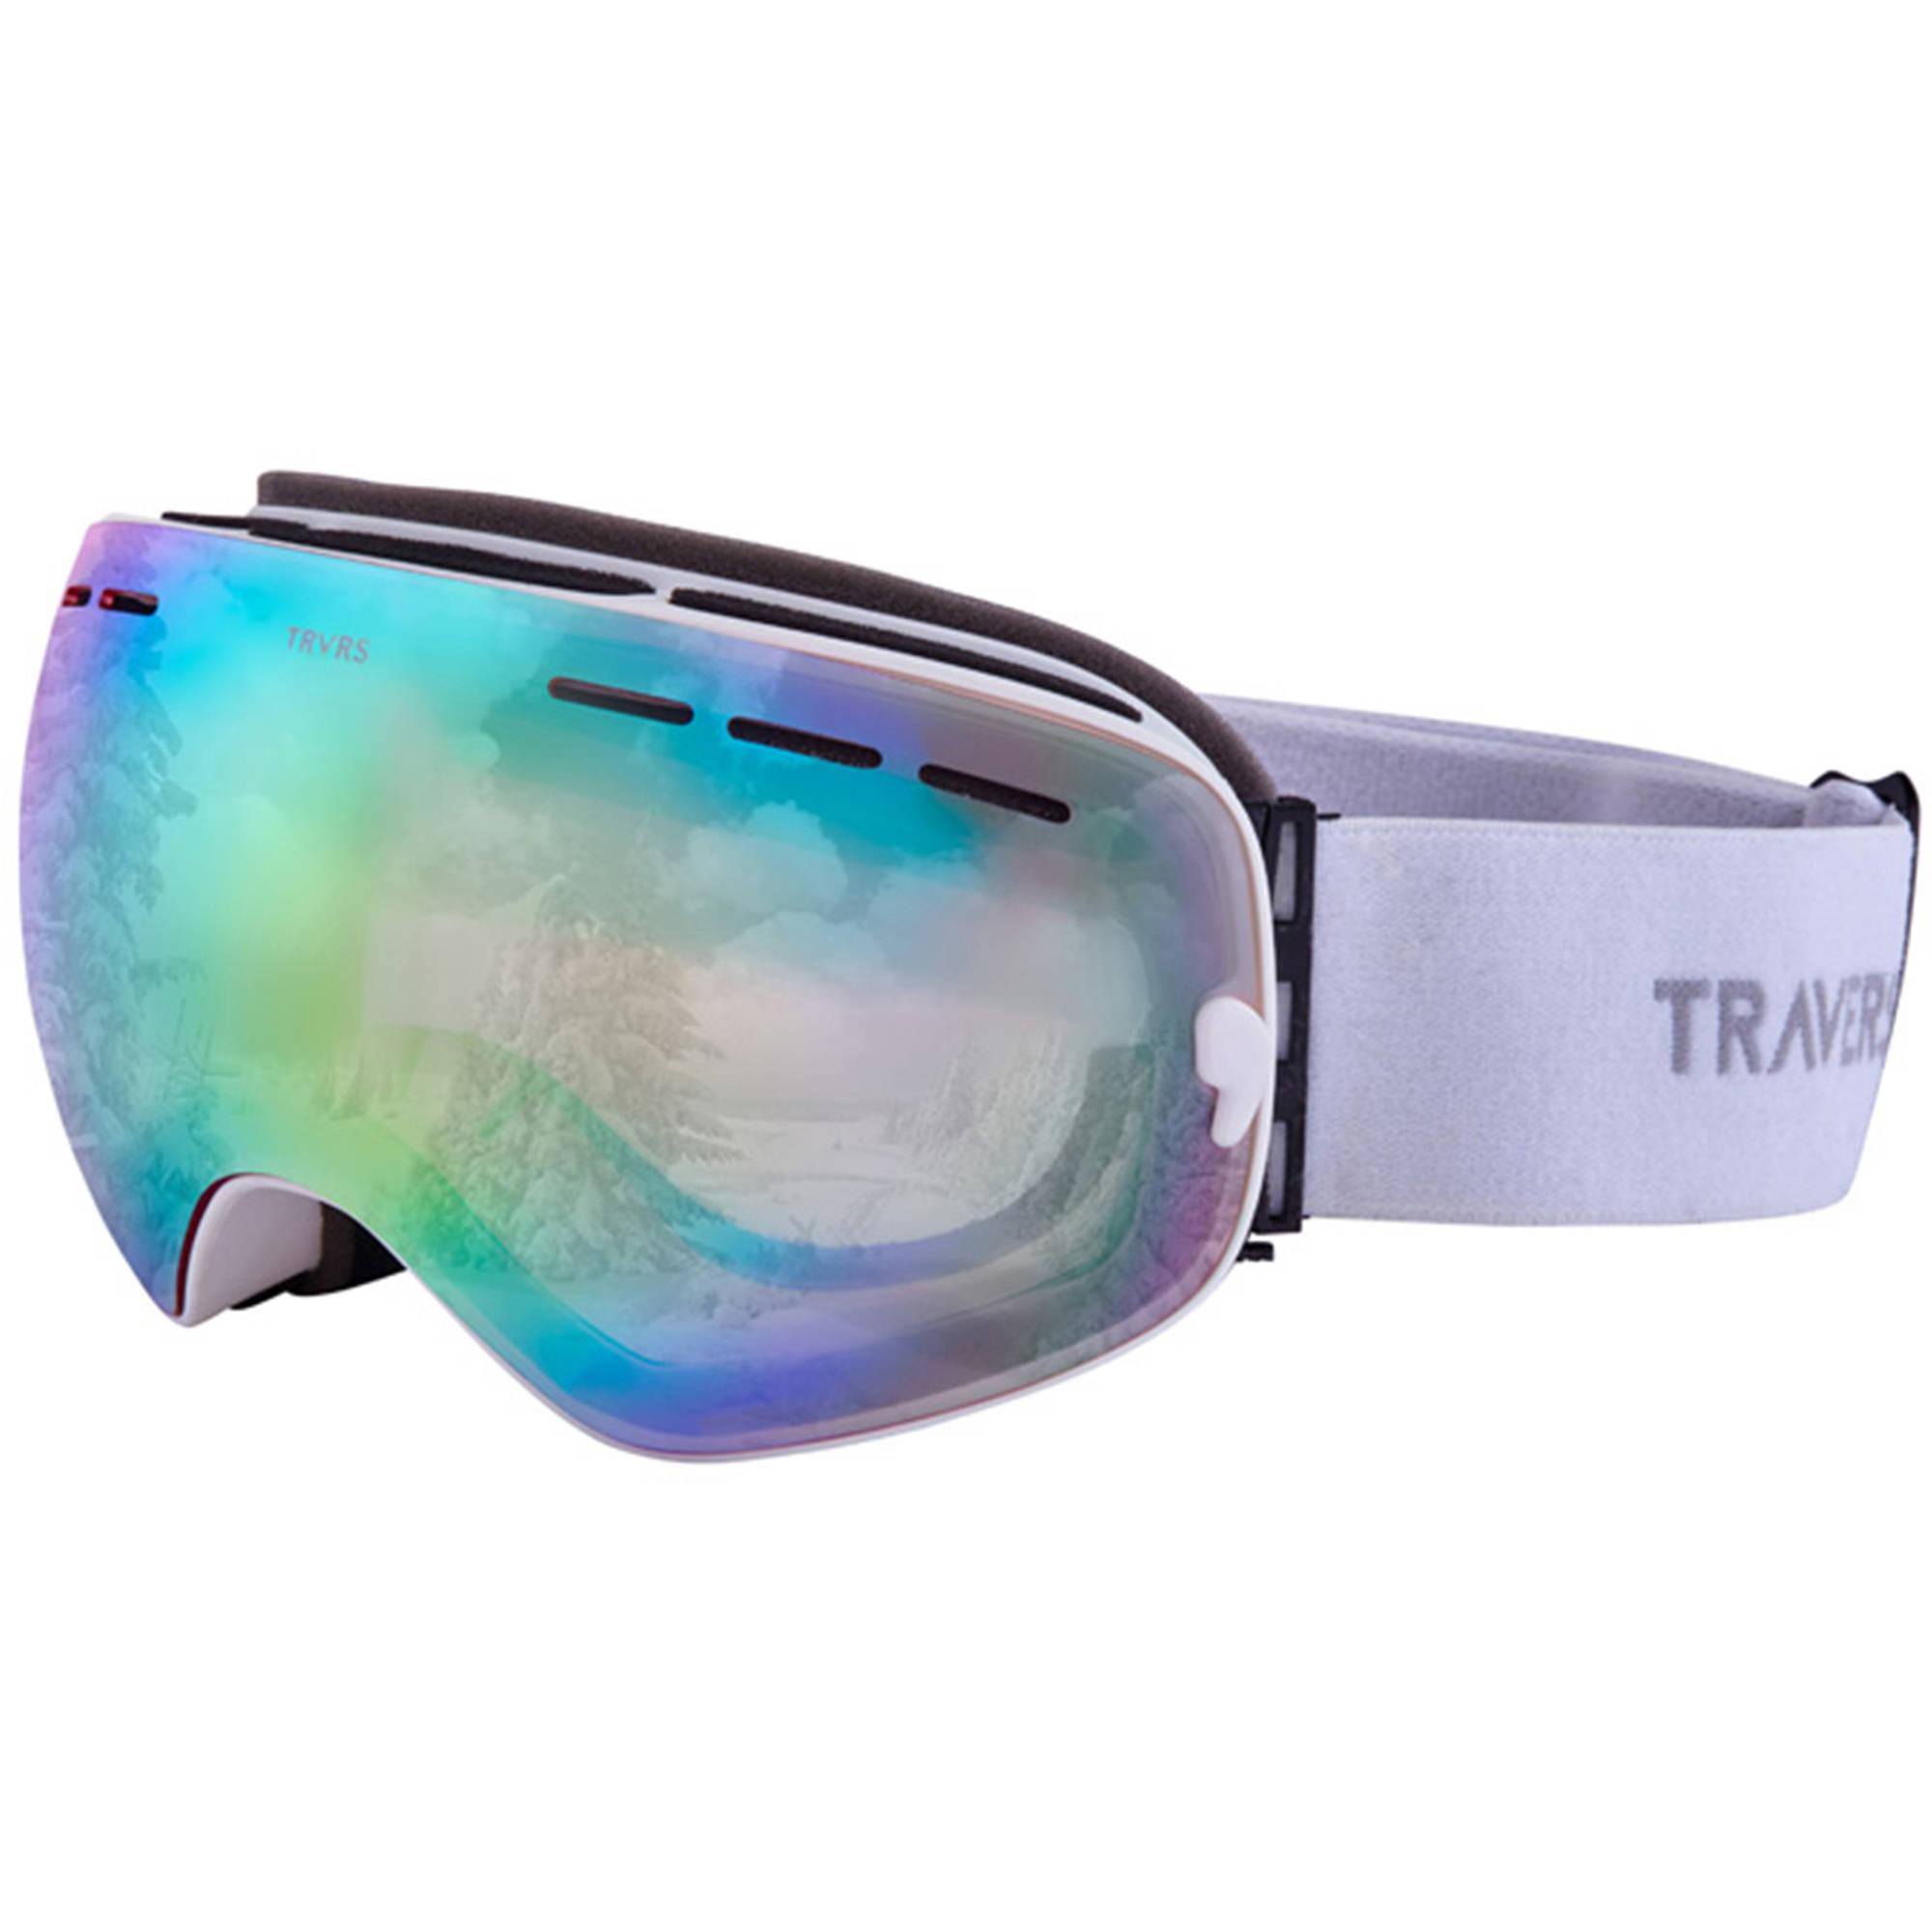 Traverse Virgata Ski, Snowboard, and Snowmobile Goggles, Multiple Colors Available